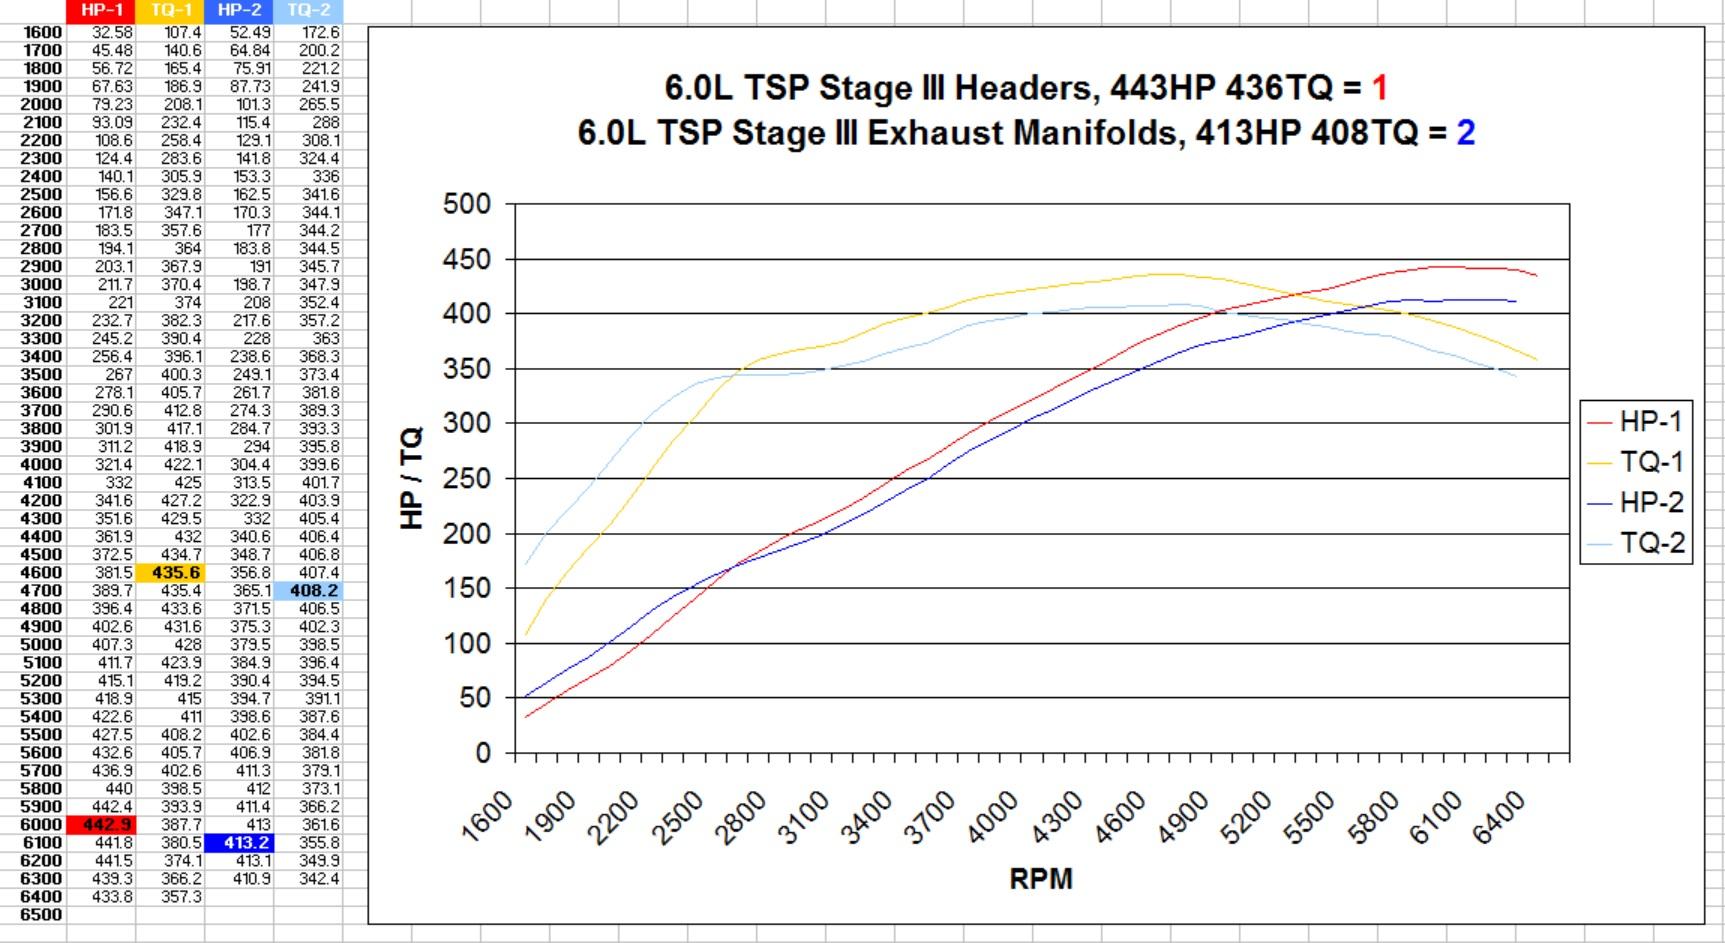 Dyno Comparison Chart - 6.0L TSP3 Headers vs Manifolds.jpg